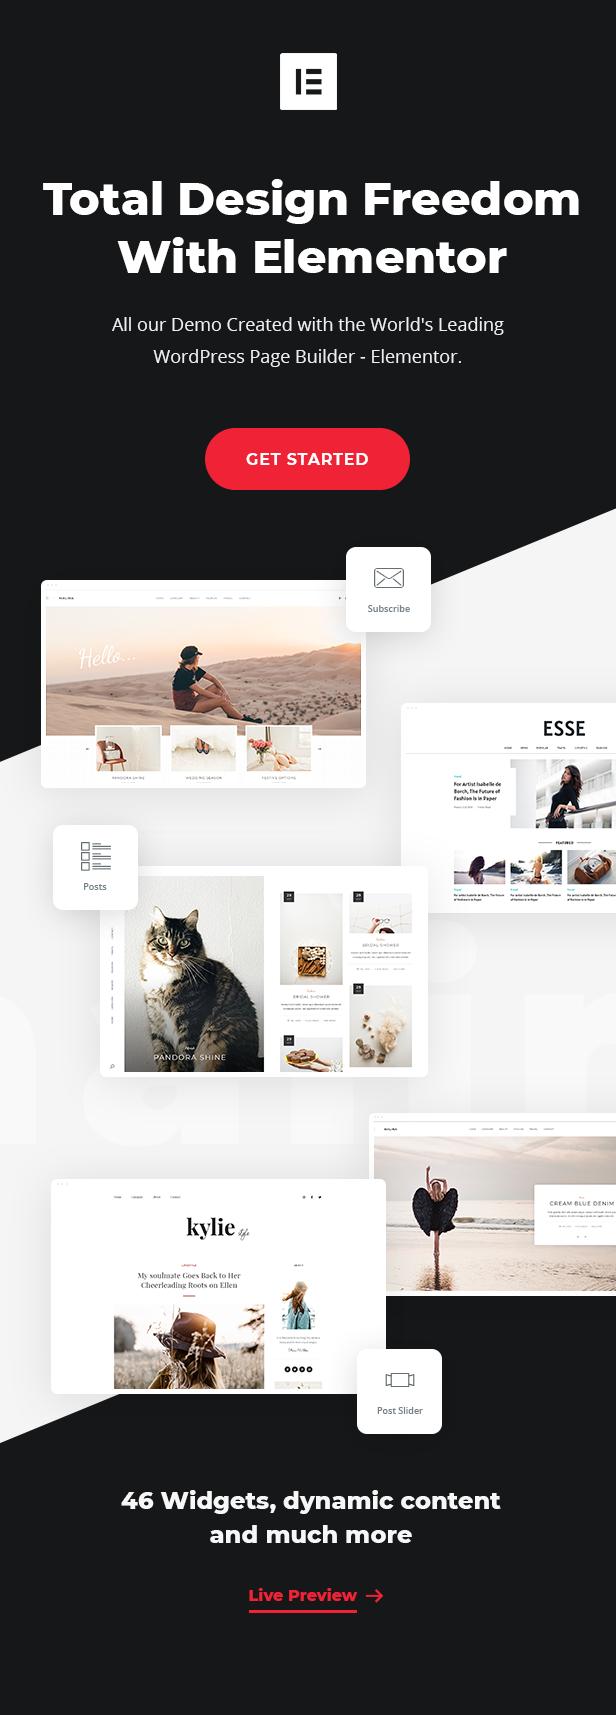 elementor desc1 - Malina - Personal WordPress Blog Theme